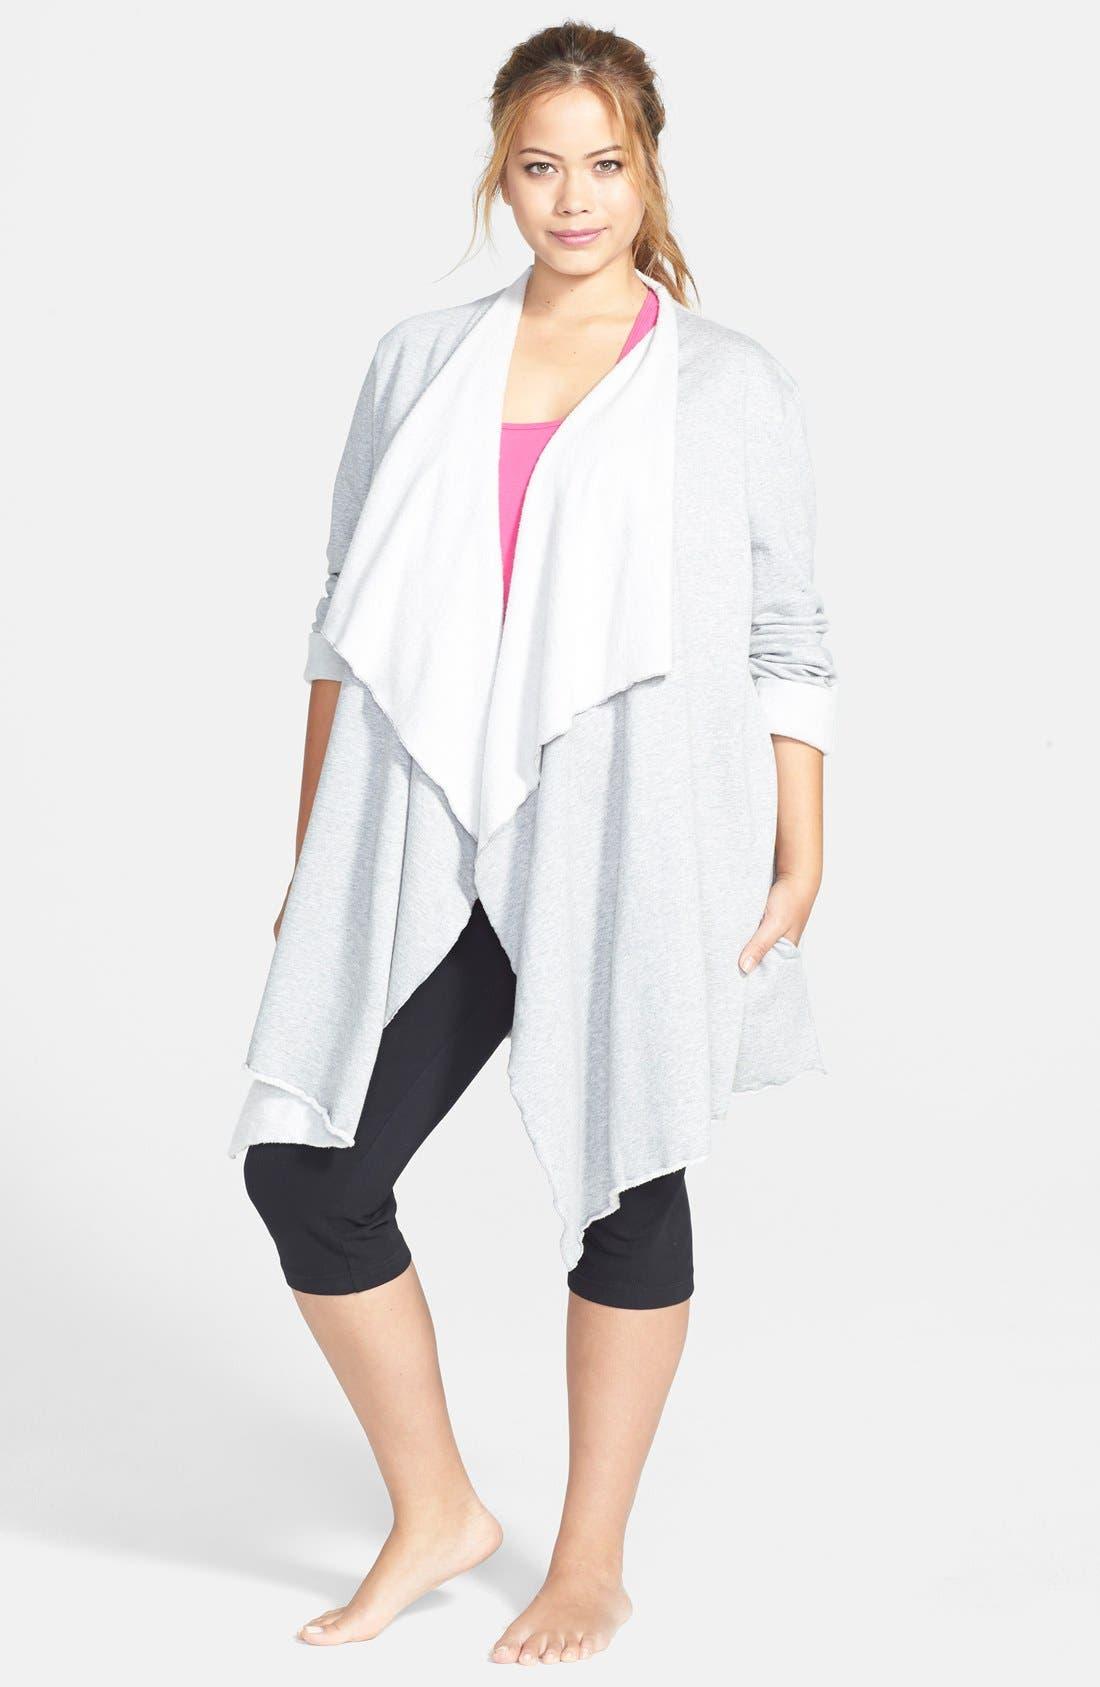 Alternate Image 1 Selected - Hard Tail 'Matrix' Fleece Open Cardigan (Plus Size)